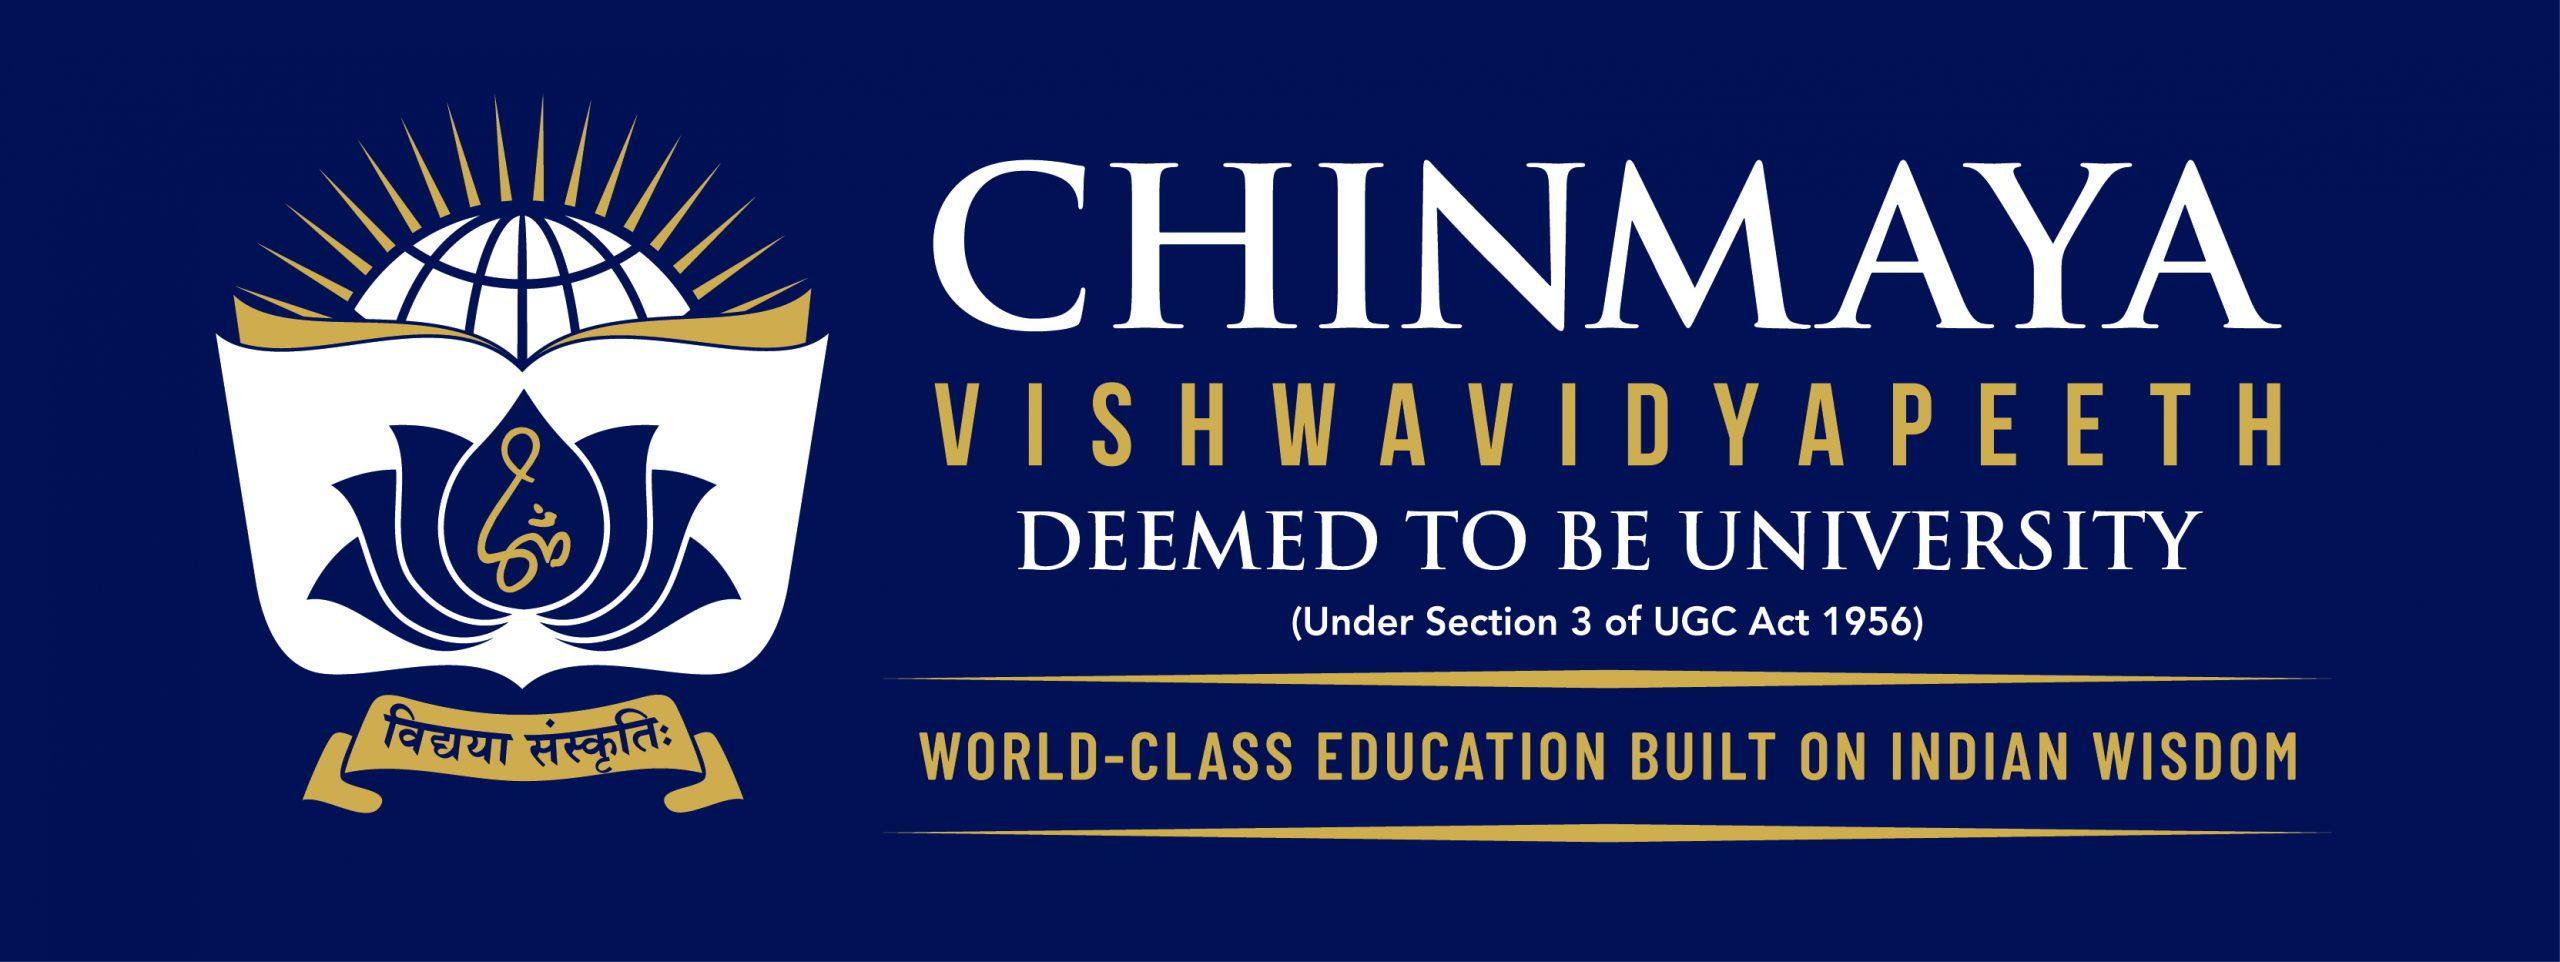 Chinmaya Vishwavidyapeeth University